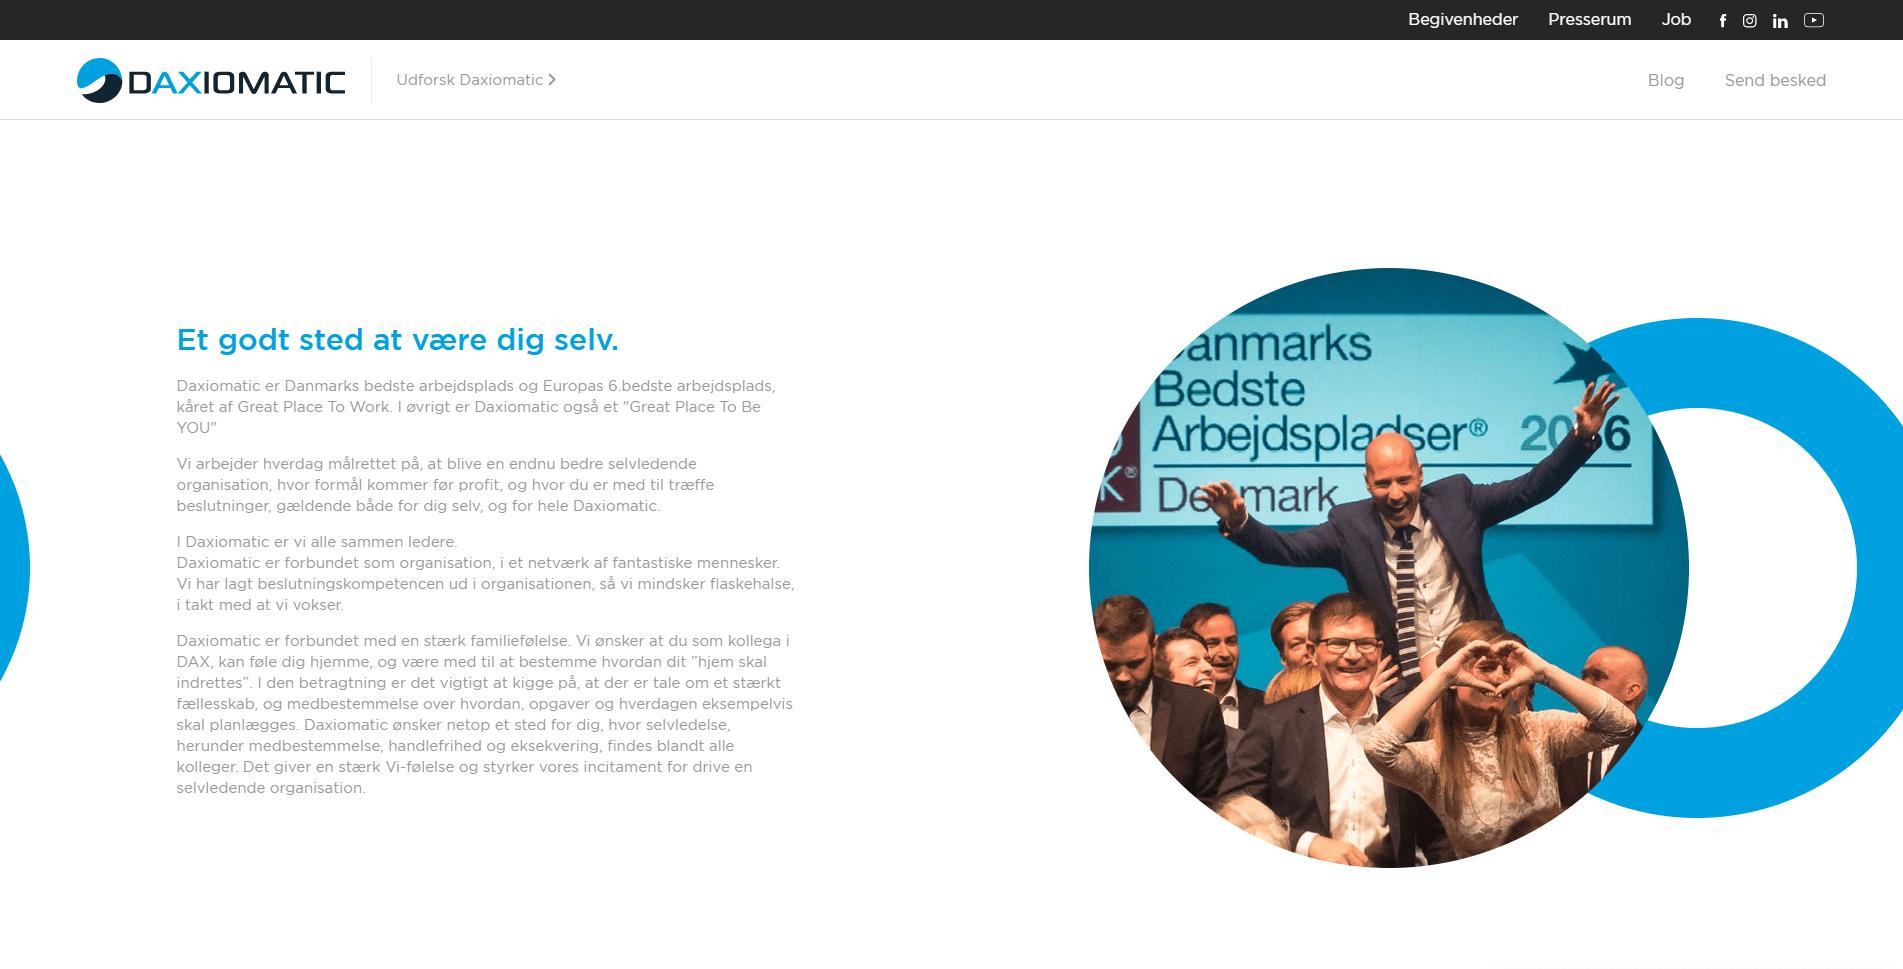 daxiomatic kultur website page